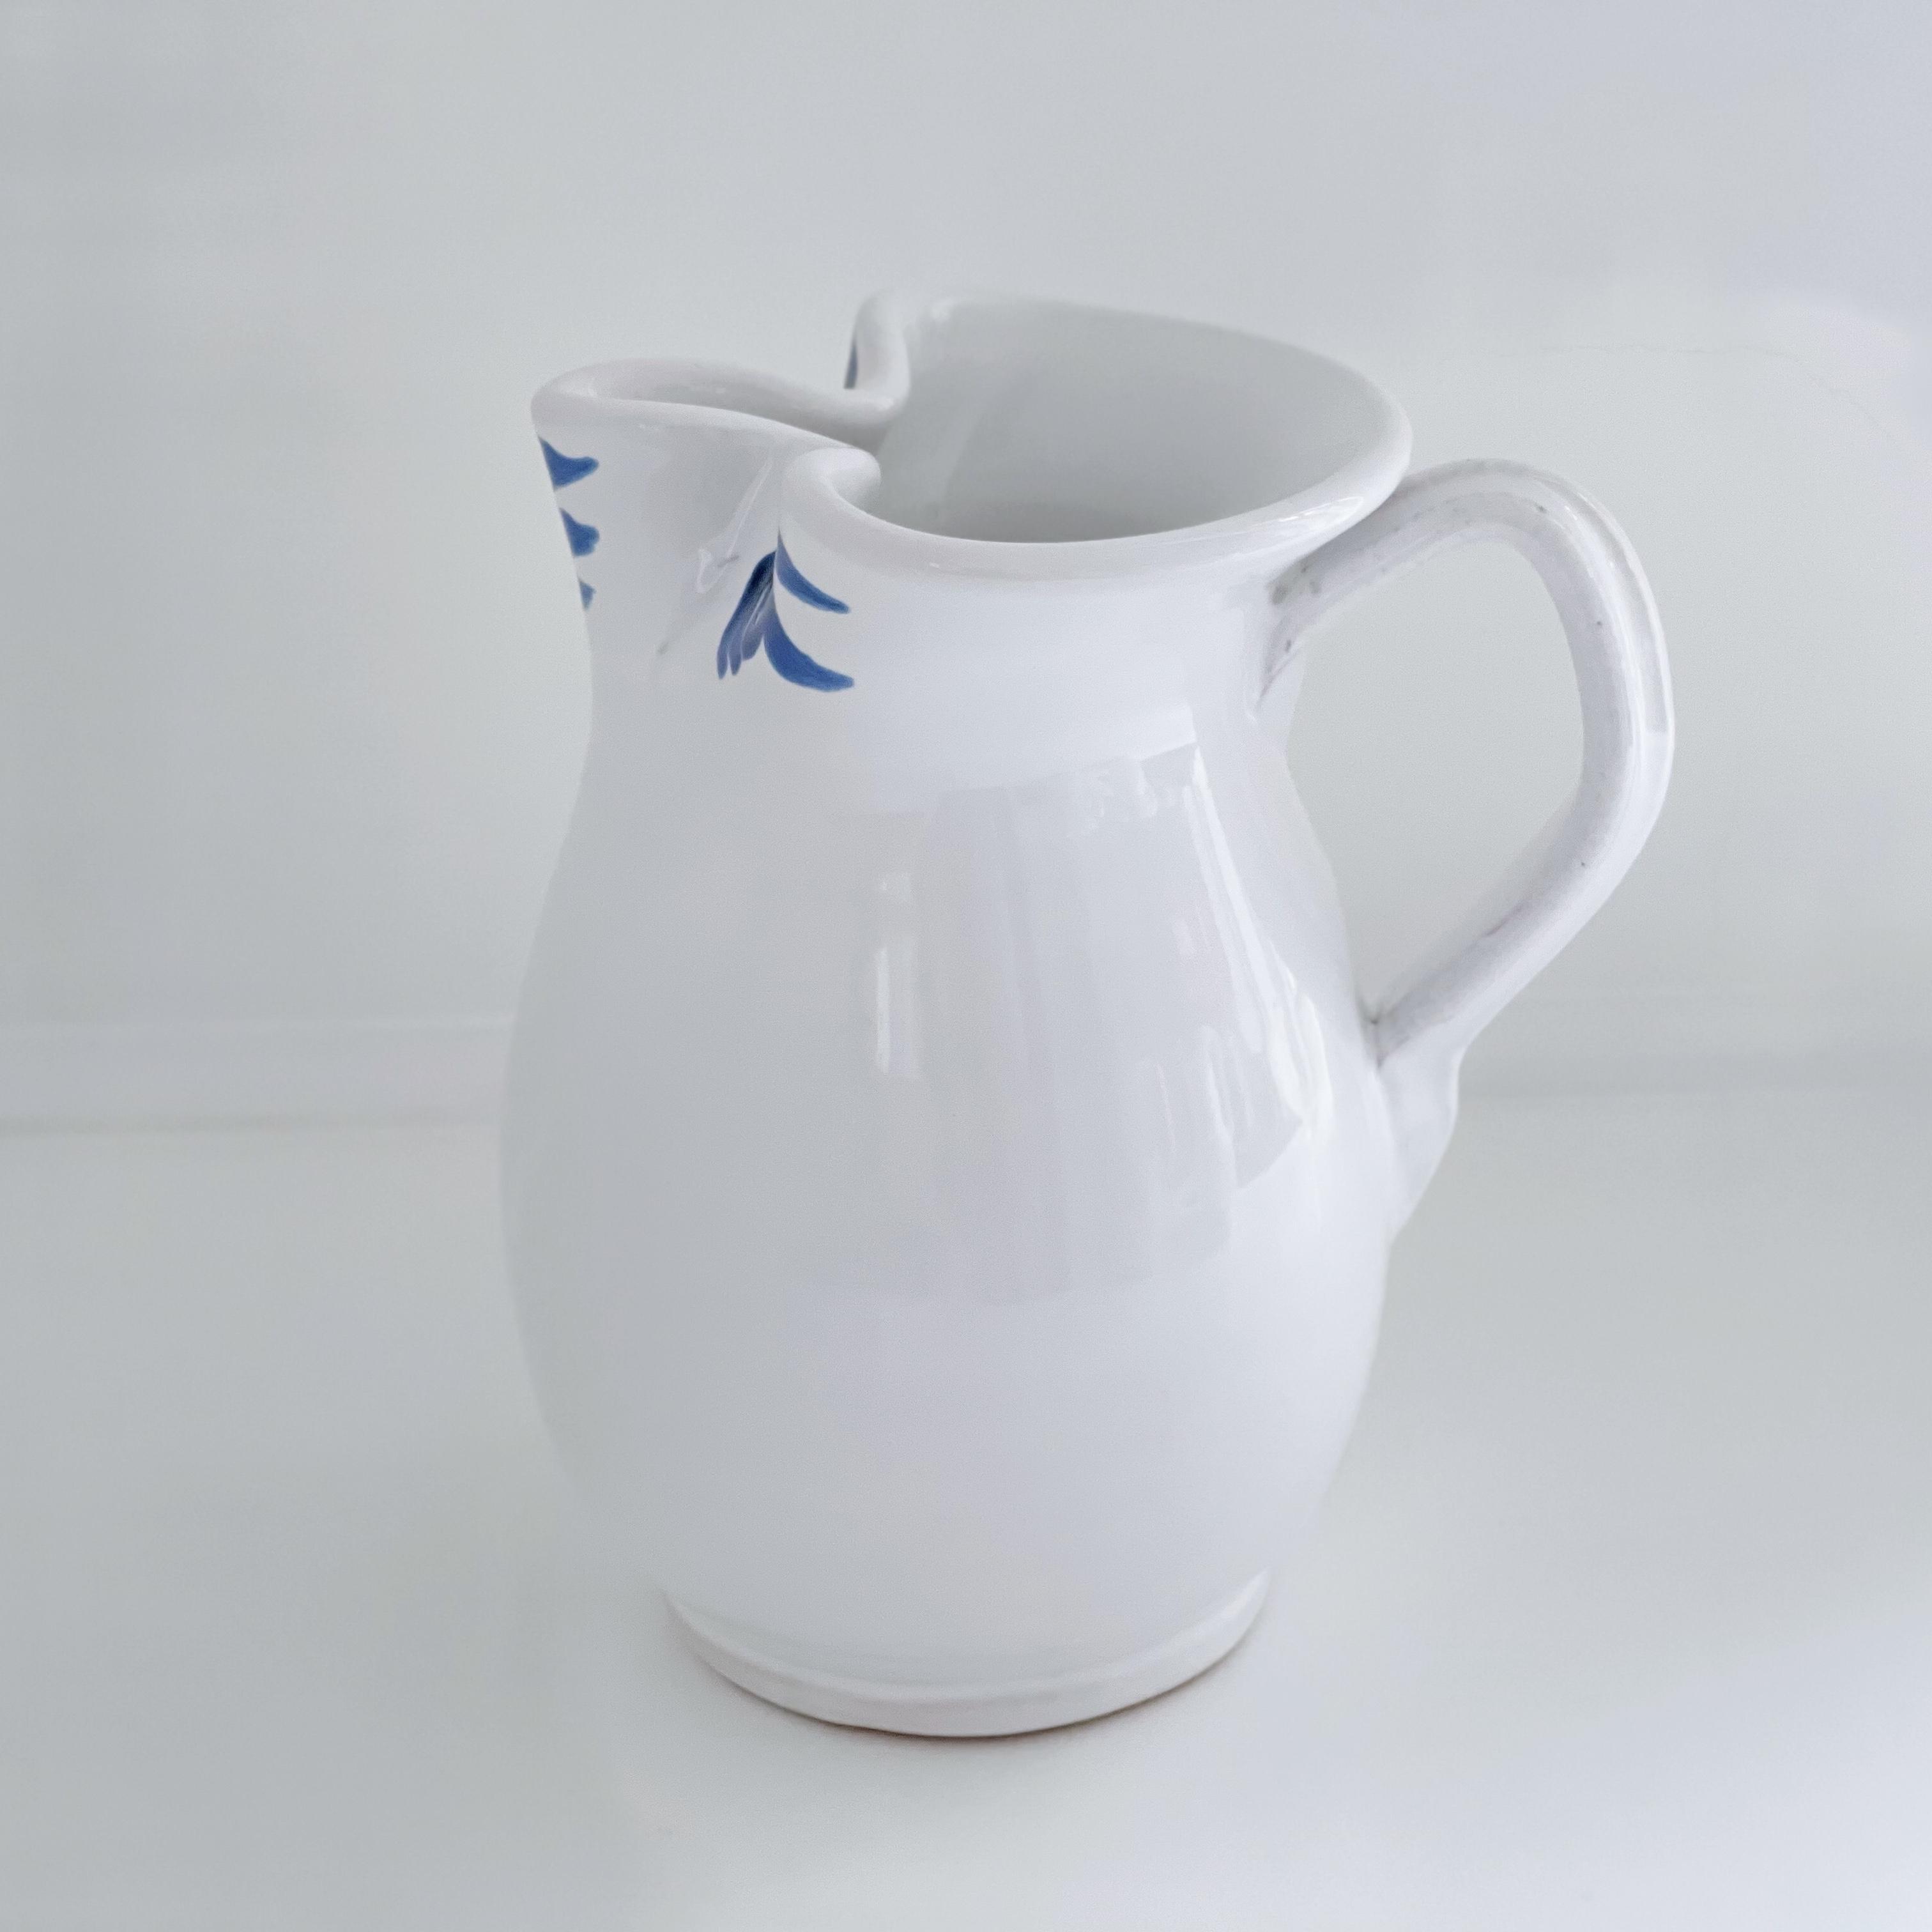 Kande / 1 liter